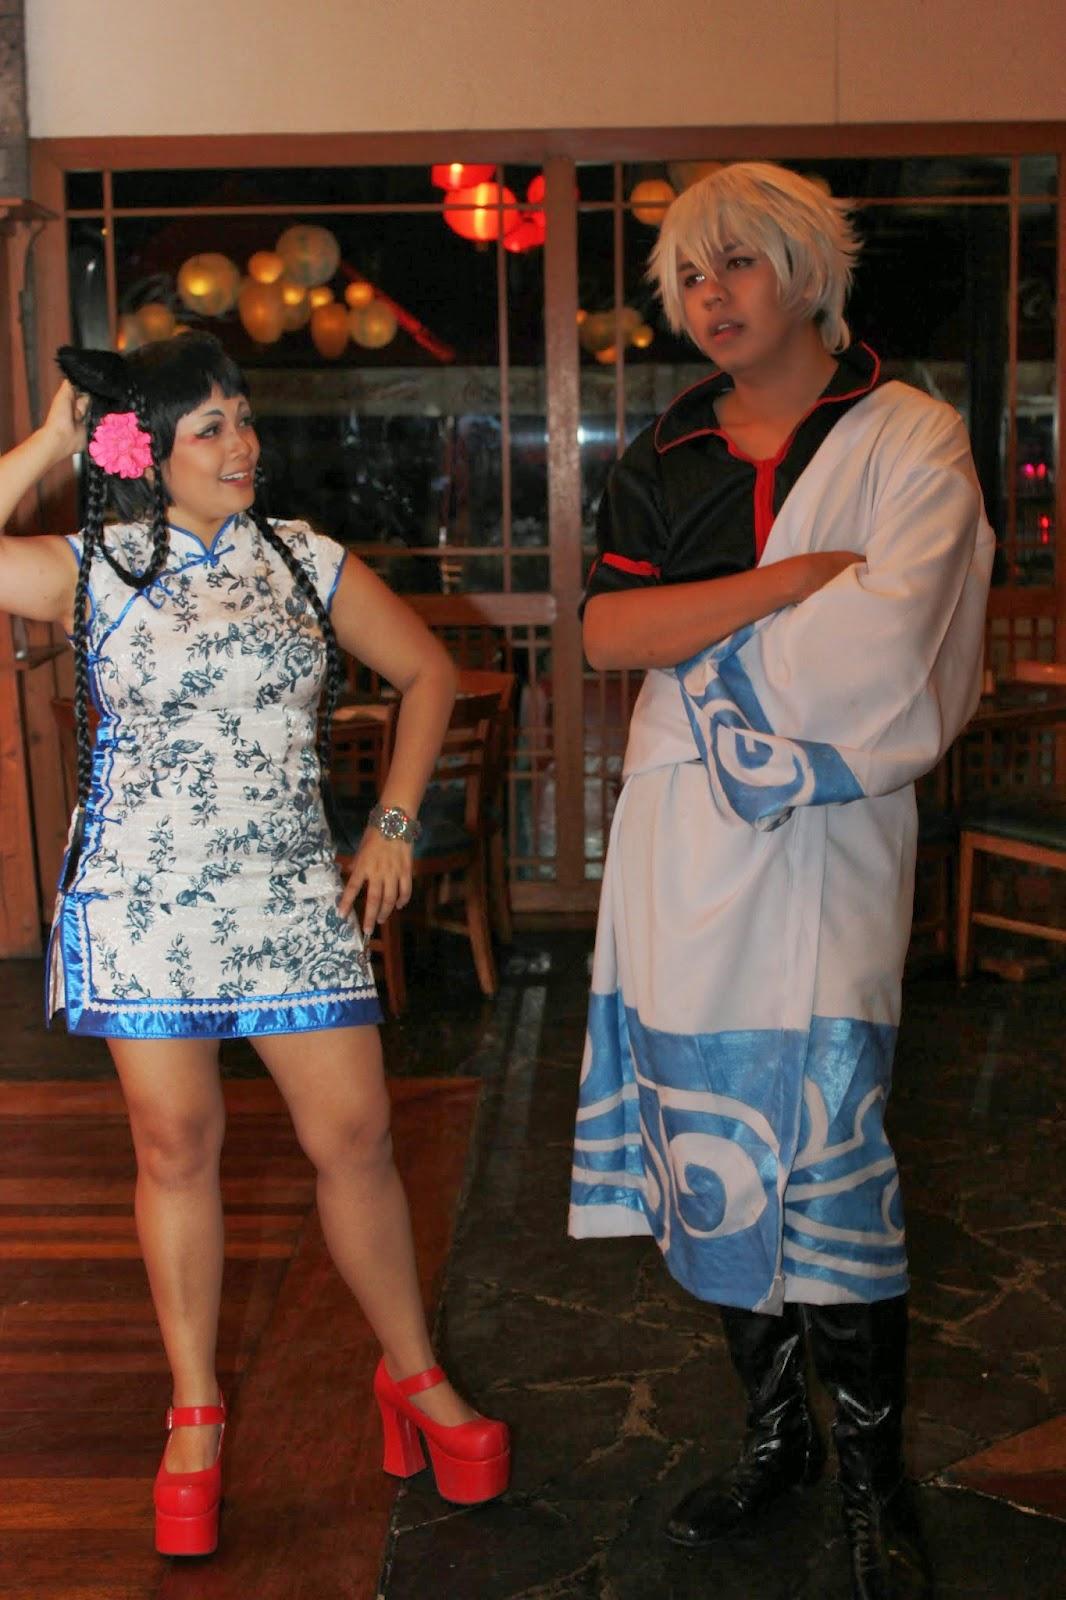 Lara Novales - Ranmao, Stein Vivero - Gin Crossover confusion